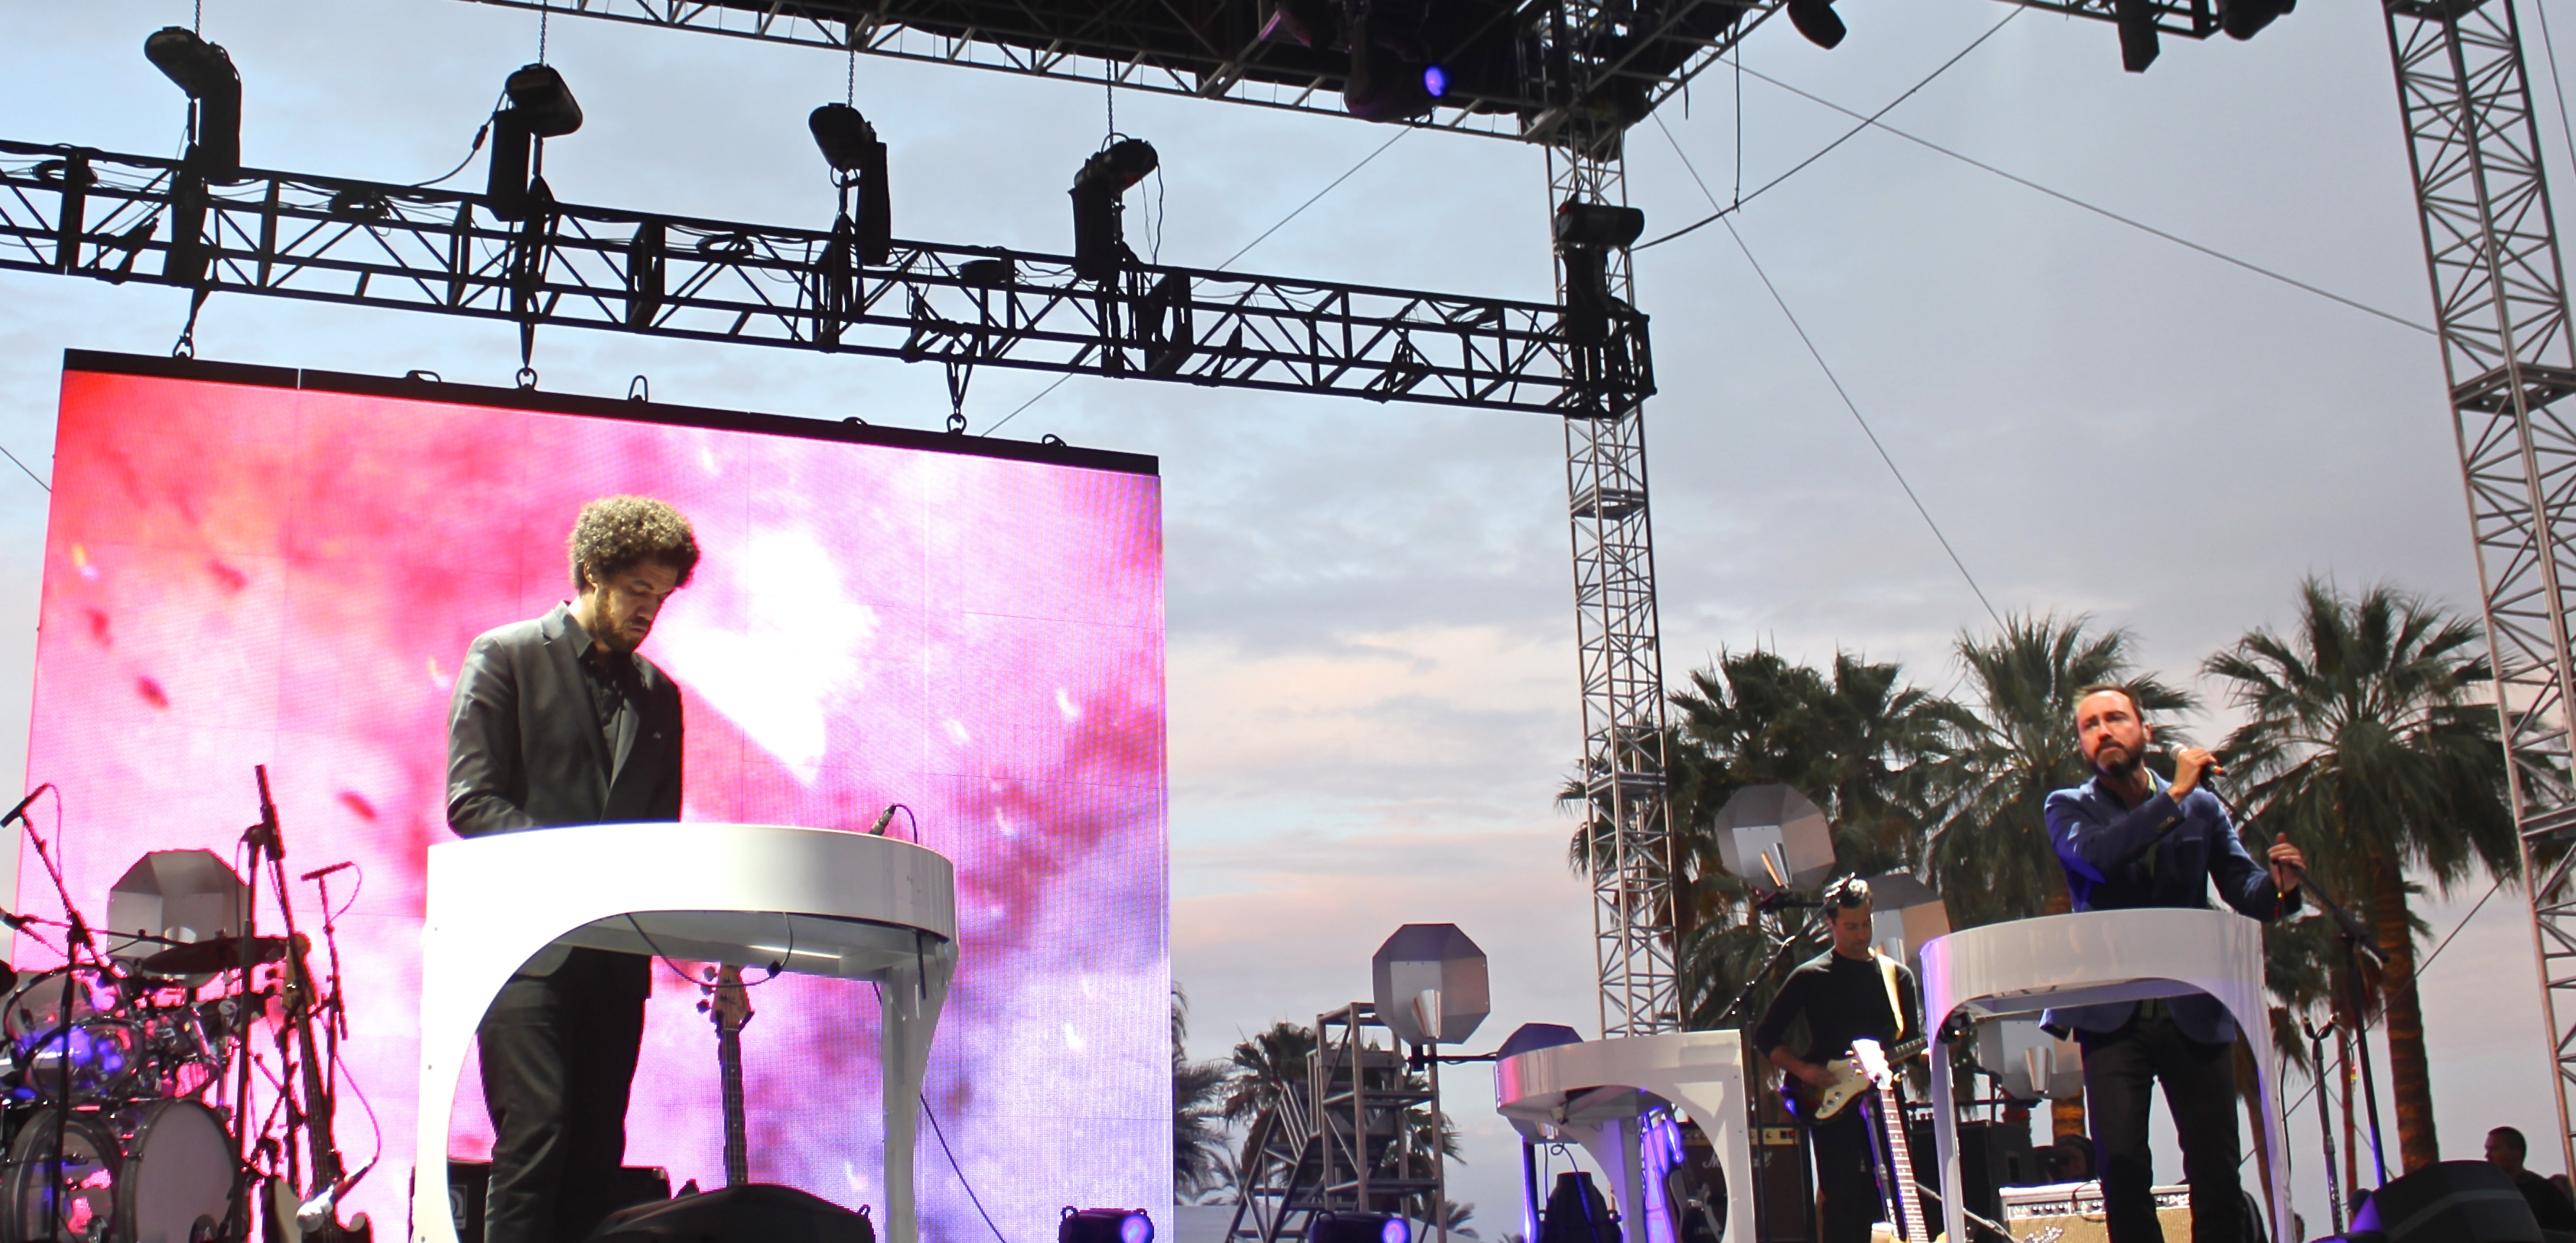 Broken Bells at Coachella 2014 on Stage